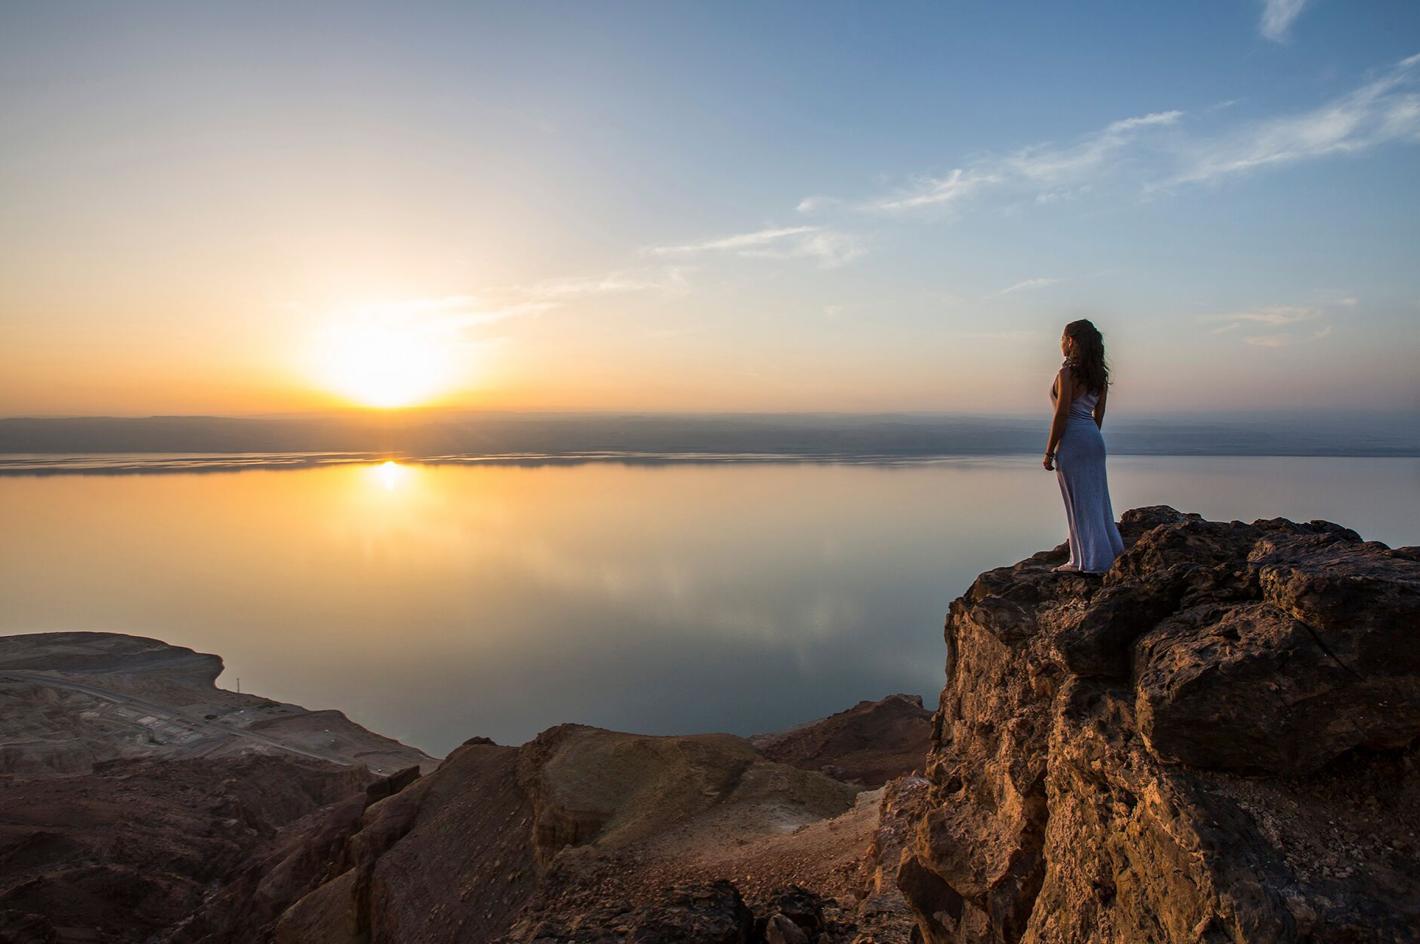 Reilly Folsom looking at the Dead Sea, Jordan